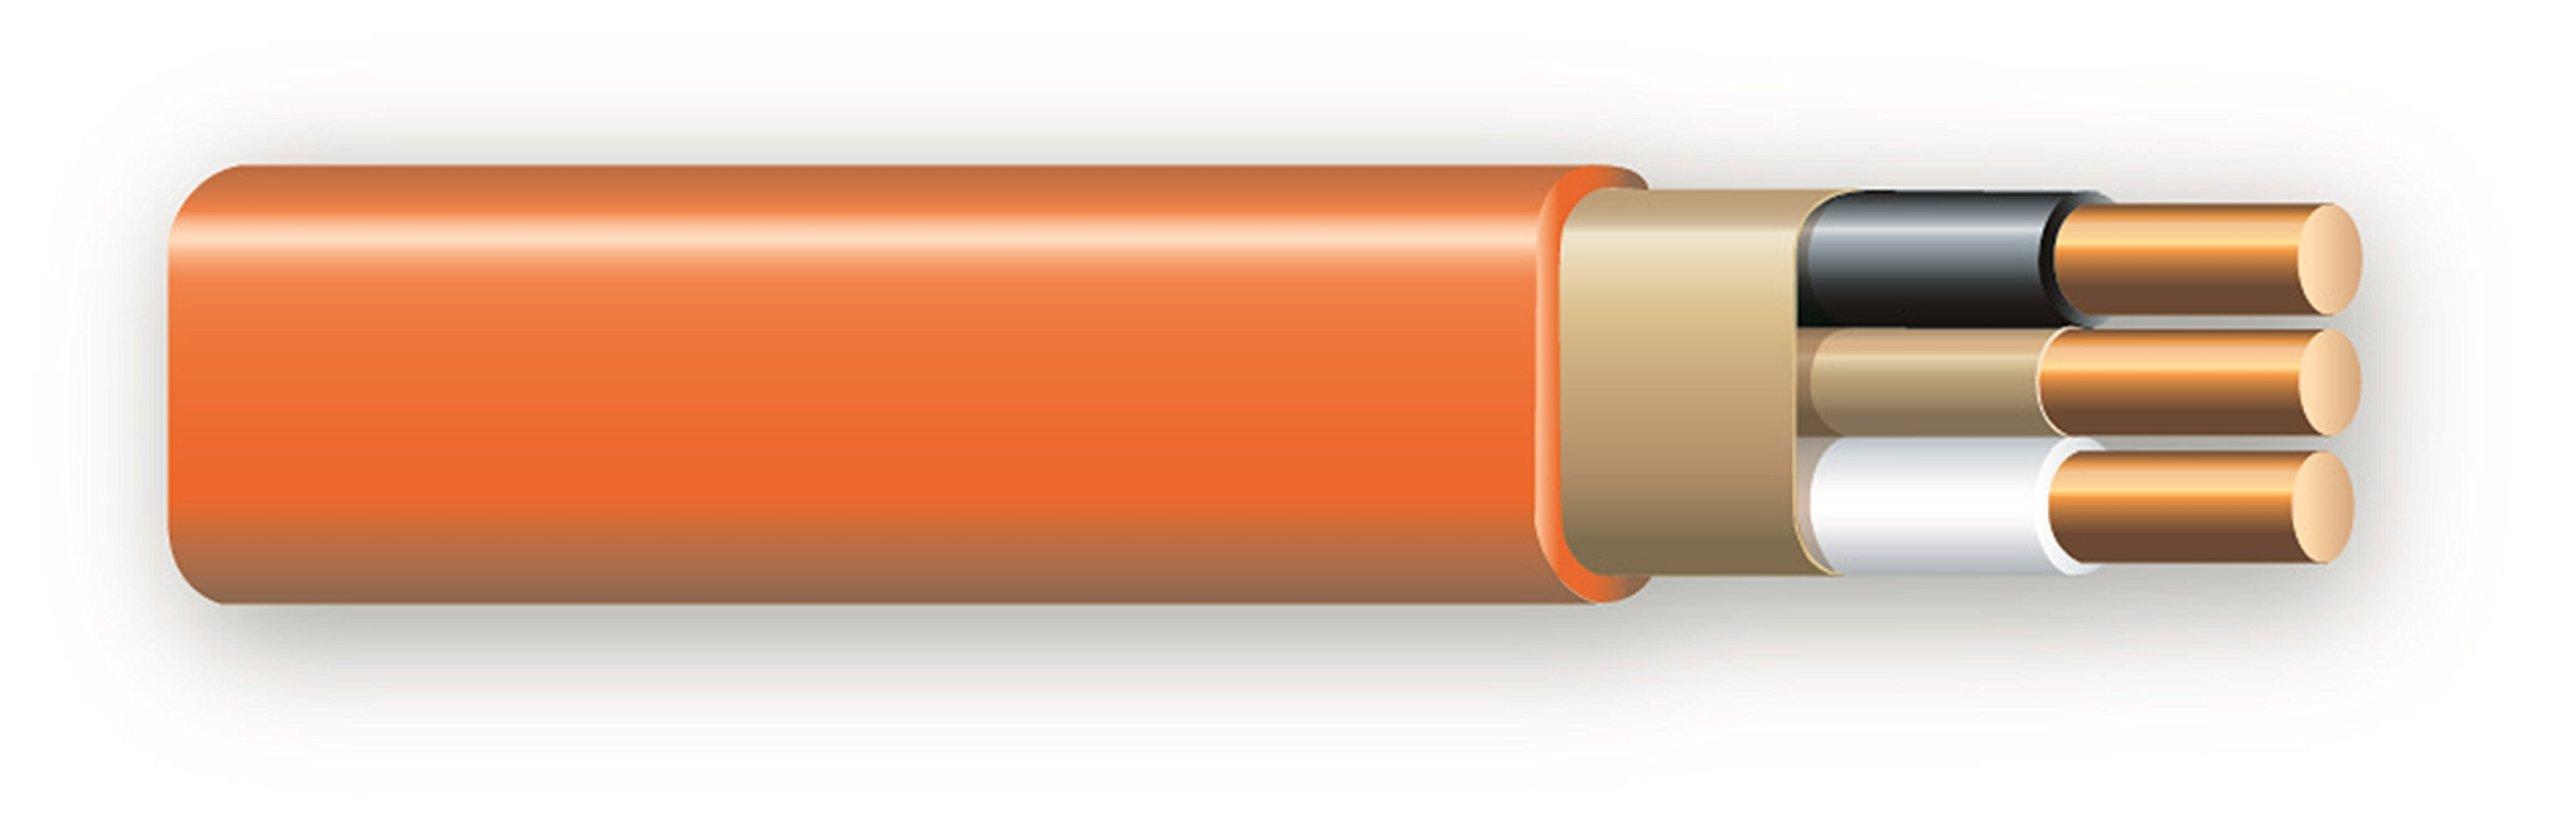 Cerrowire 147-1802CR-2 100-Feet 10/2 NM-B Solid with Ground Wire, Orange